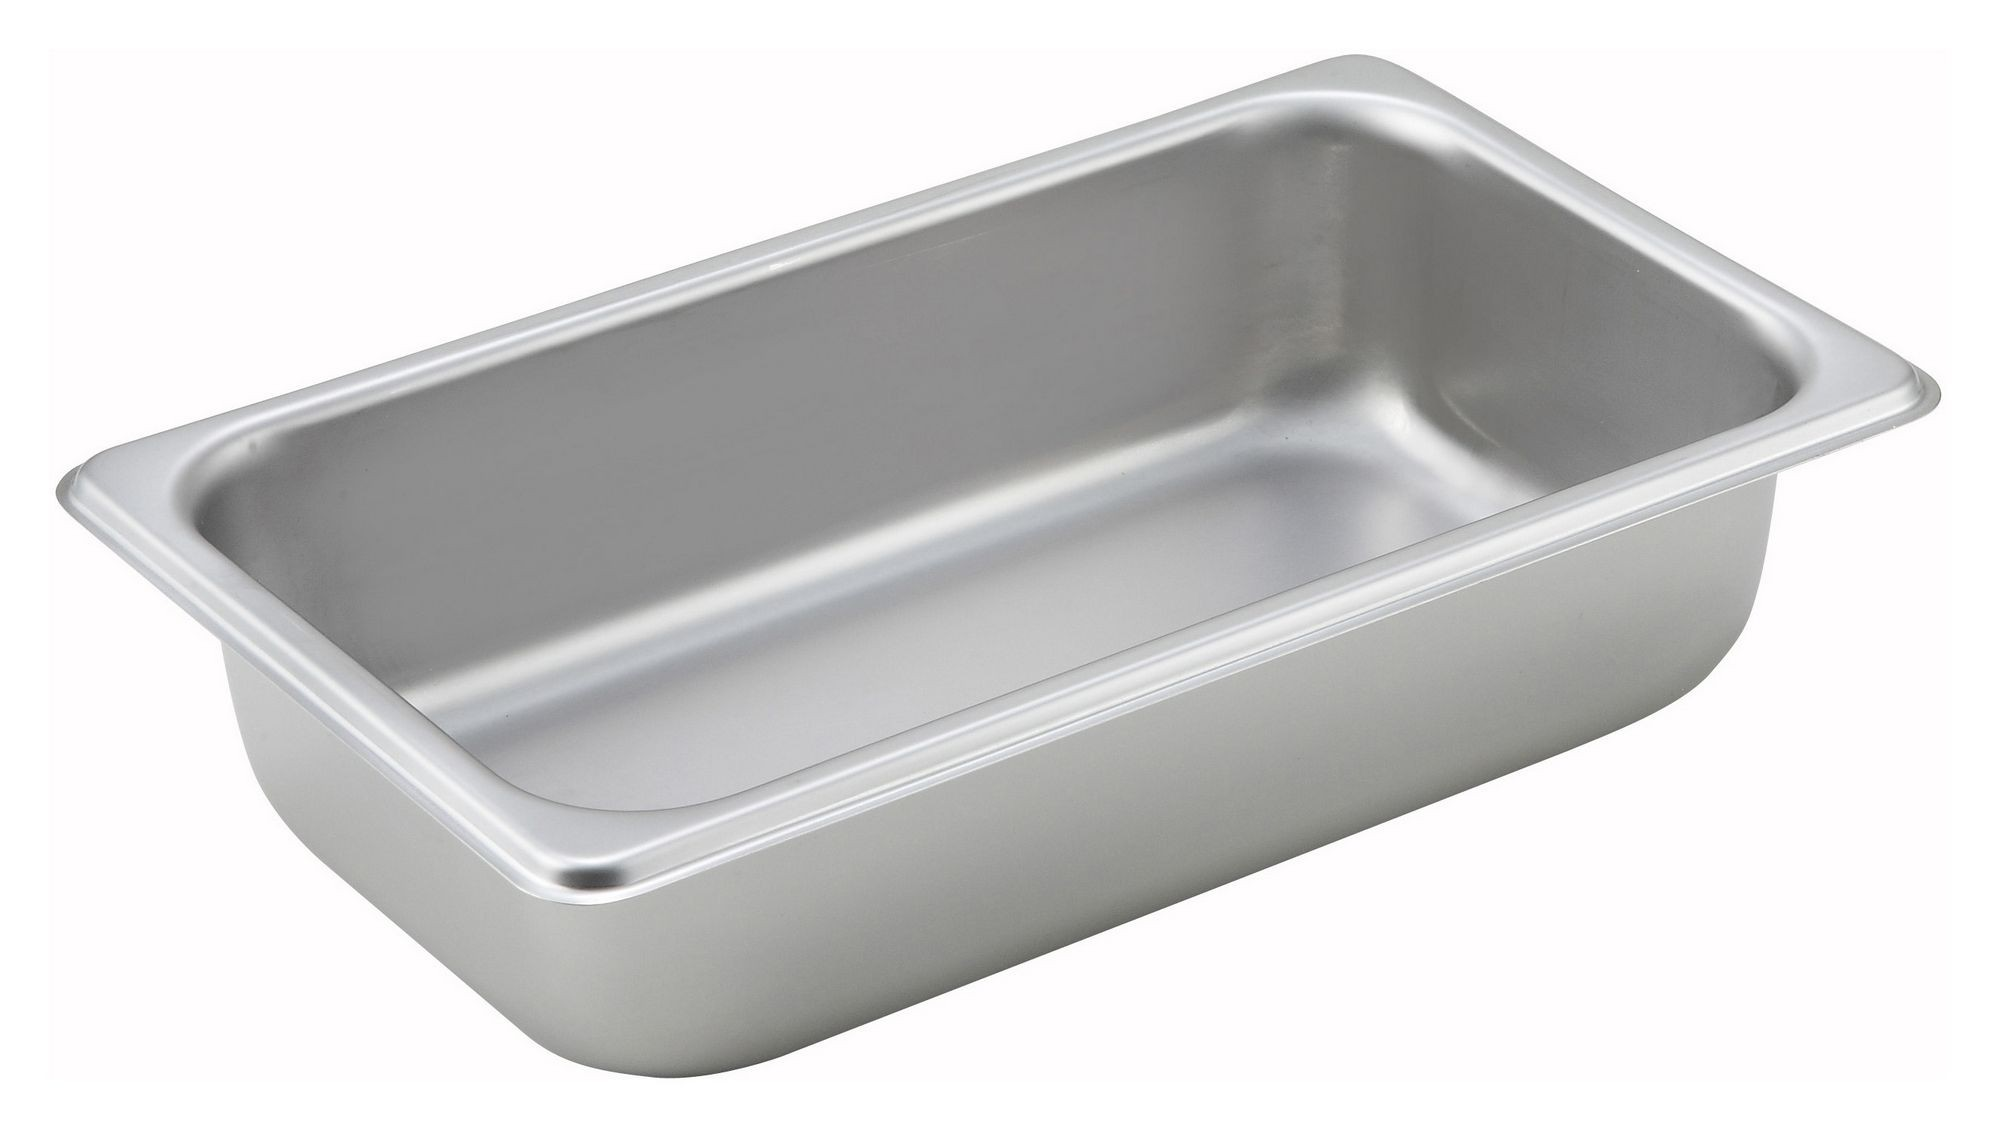 "Winco SPQ2 1/4 Size Standard Weight Steam Table Pan 2-1/2"" Deep"